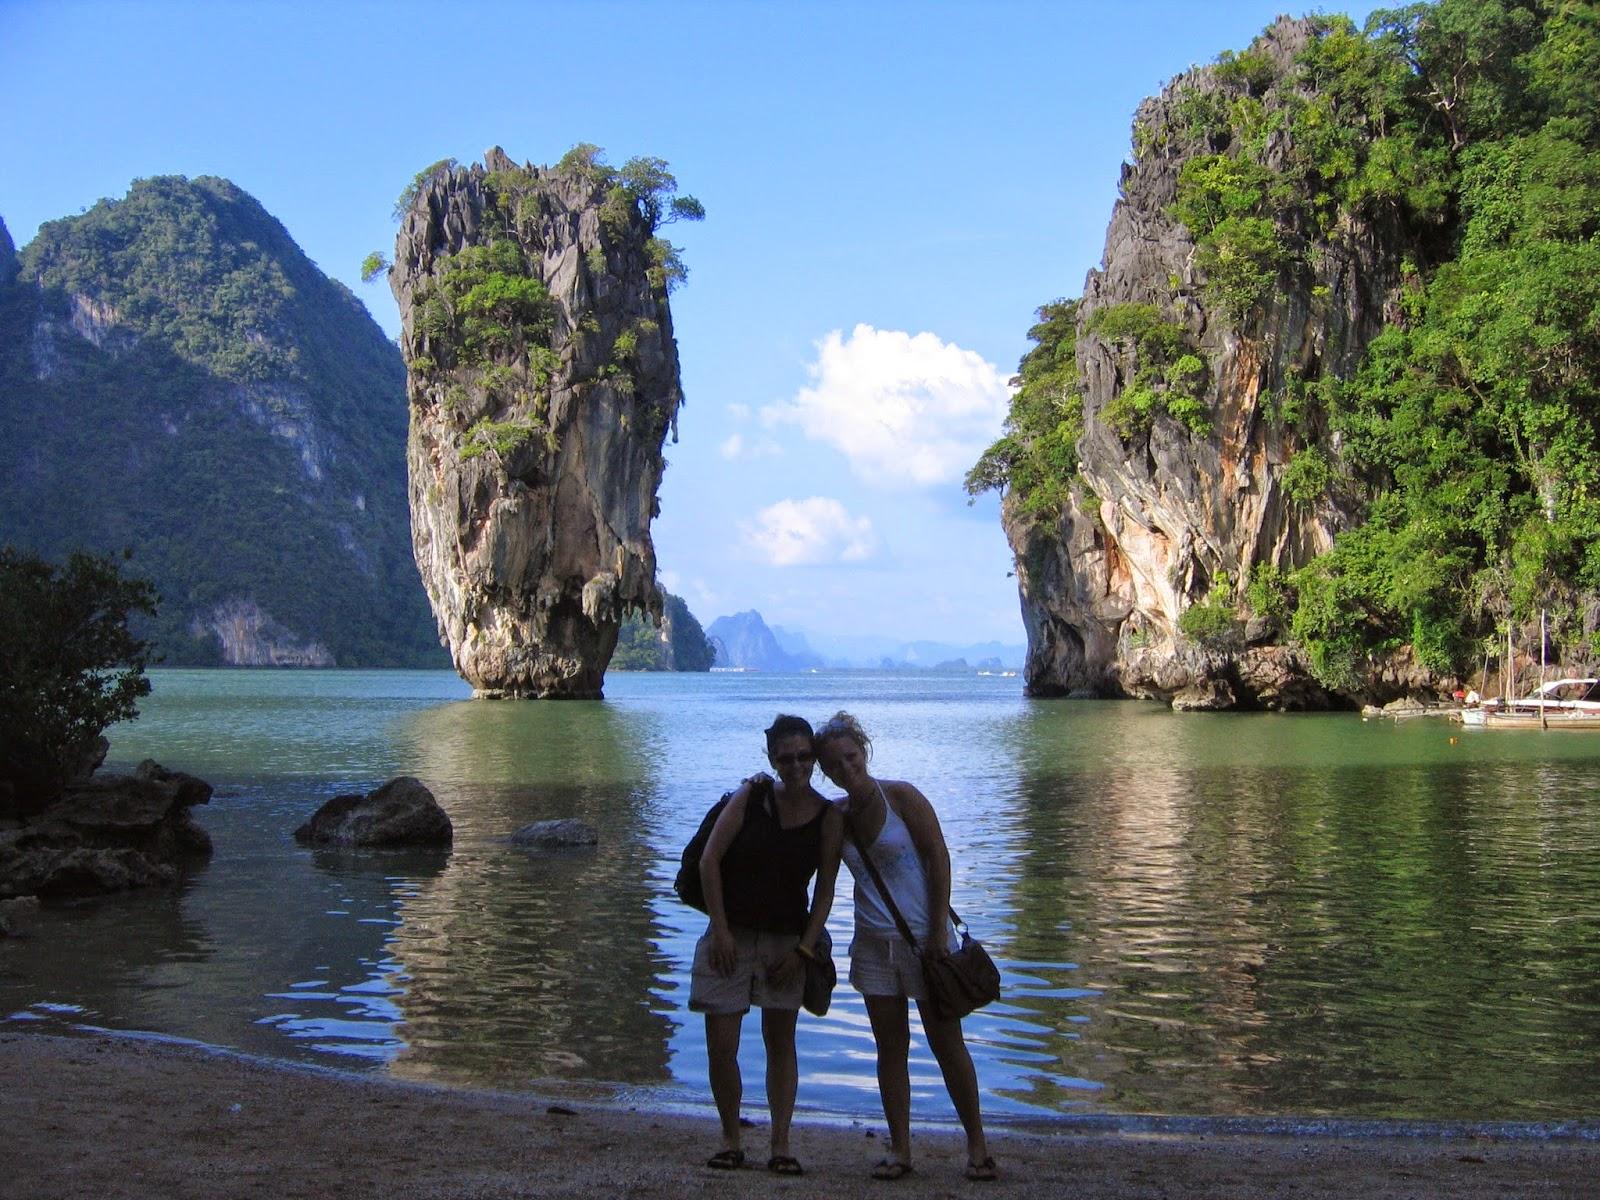 massage malmö thai dating website